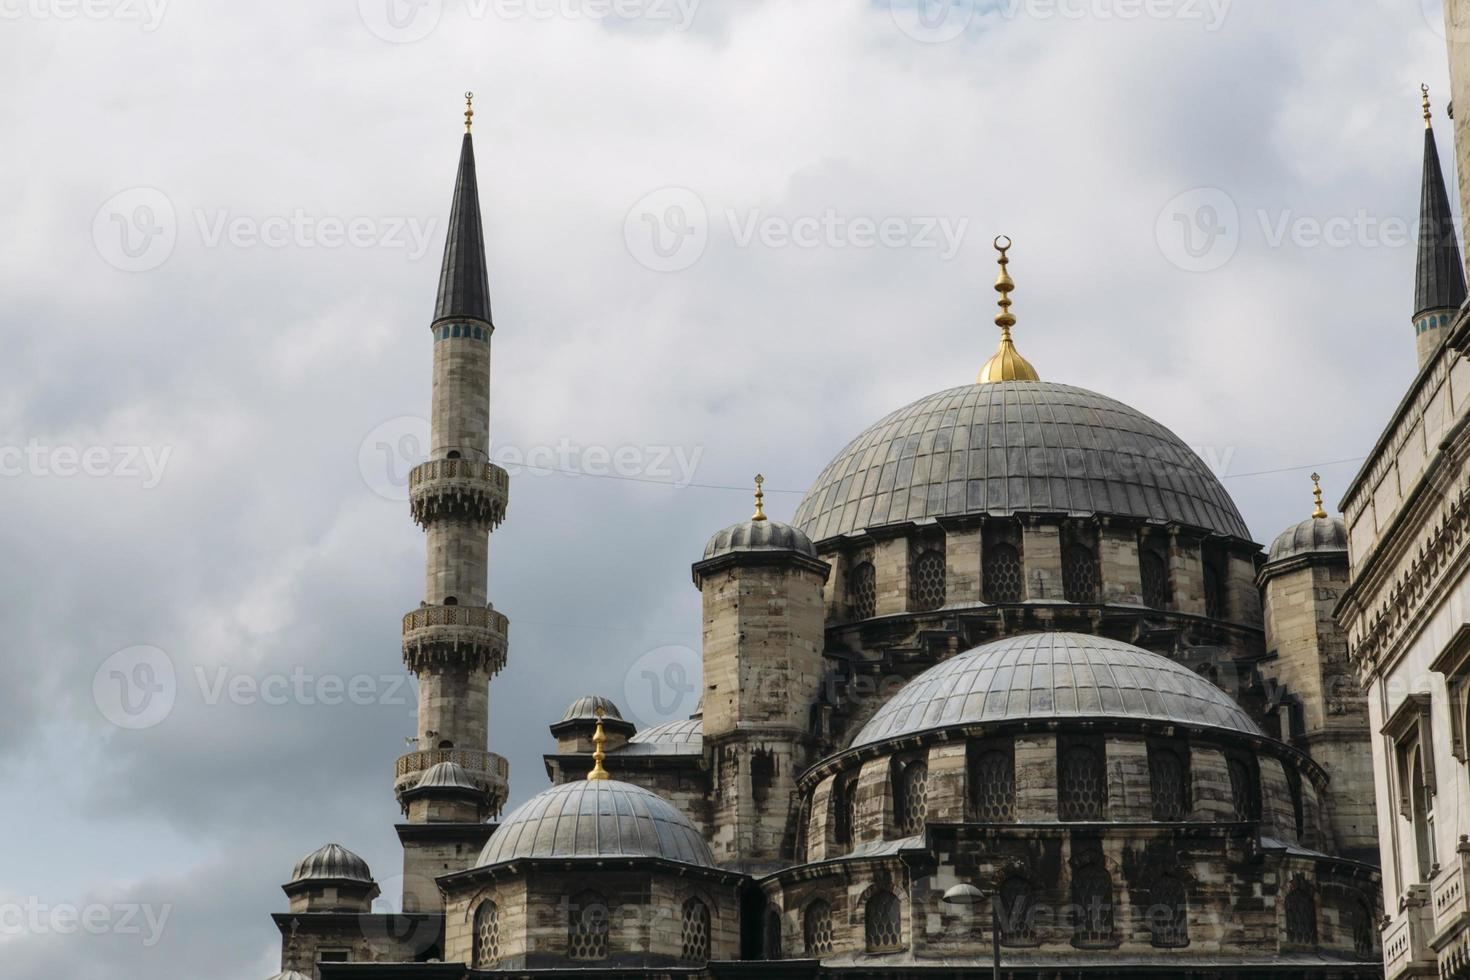 yeni cami, ny moské, berömd arkitektonisk istanbul. foto